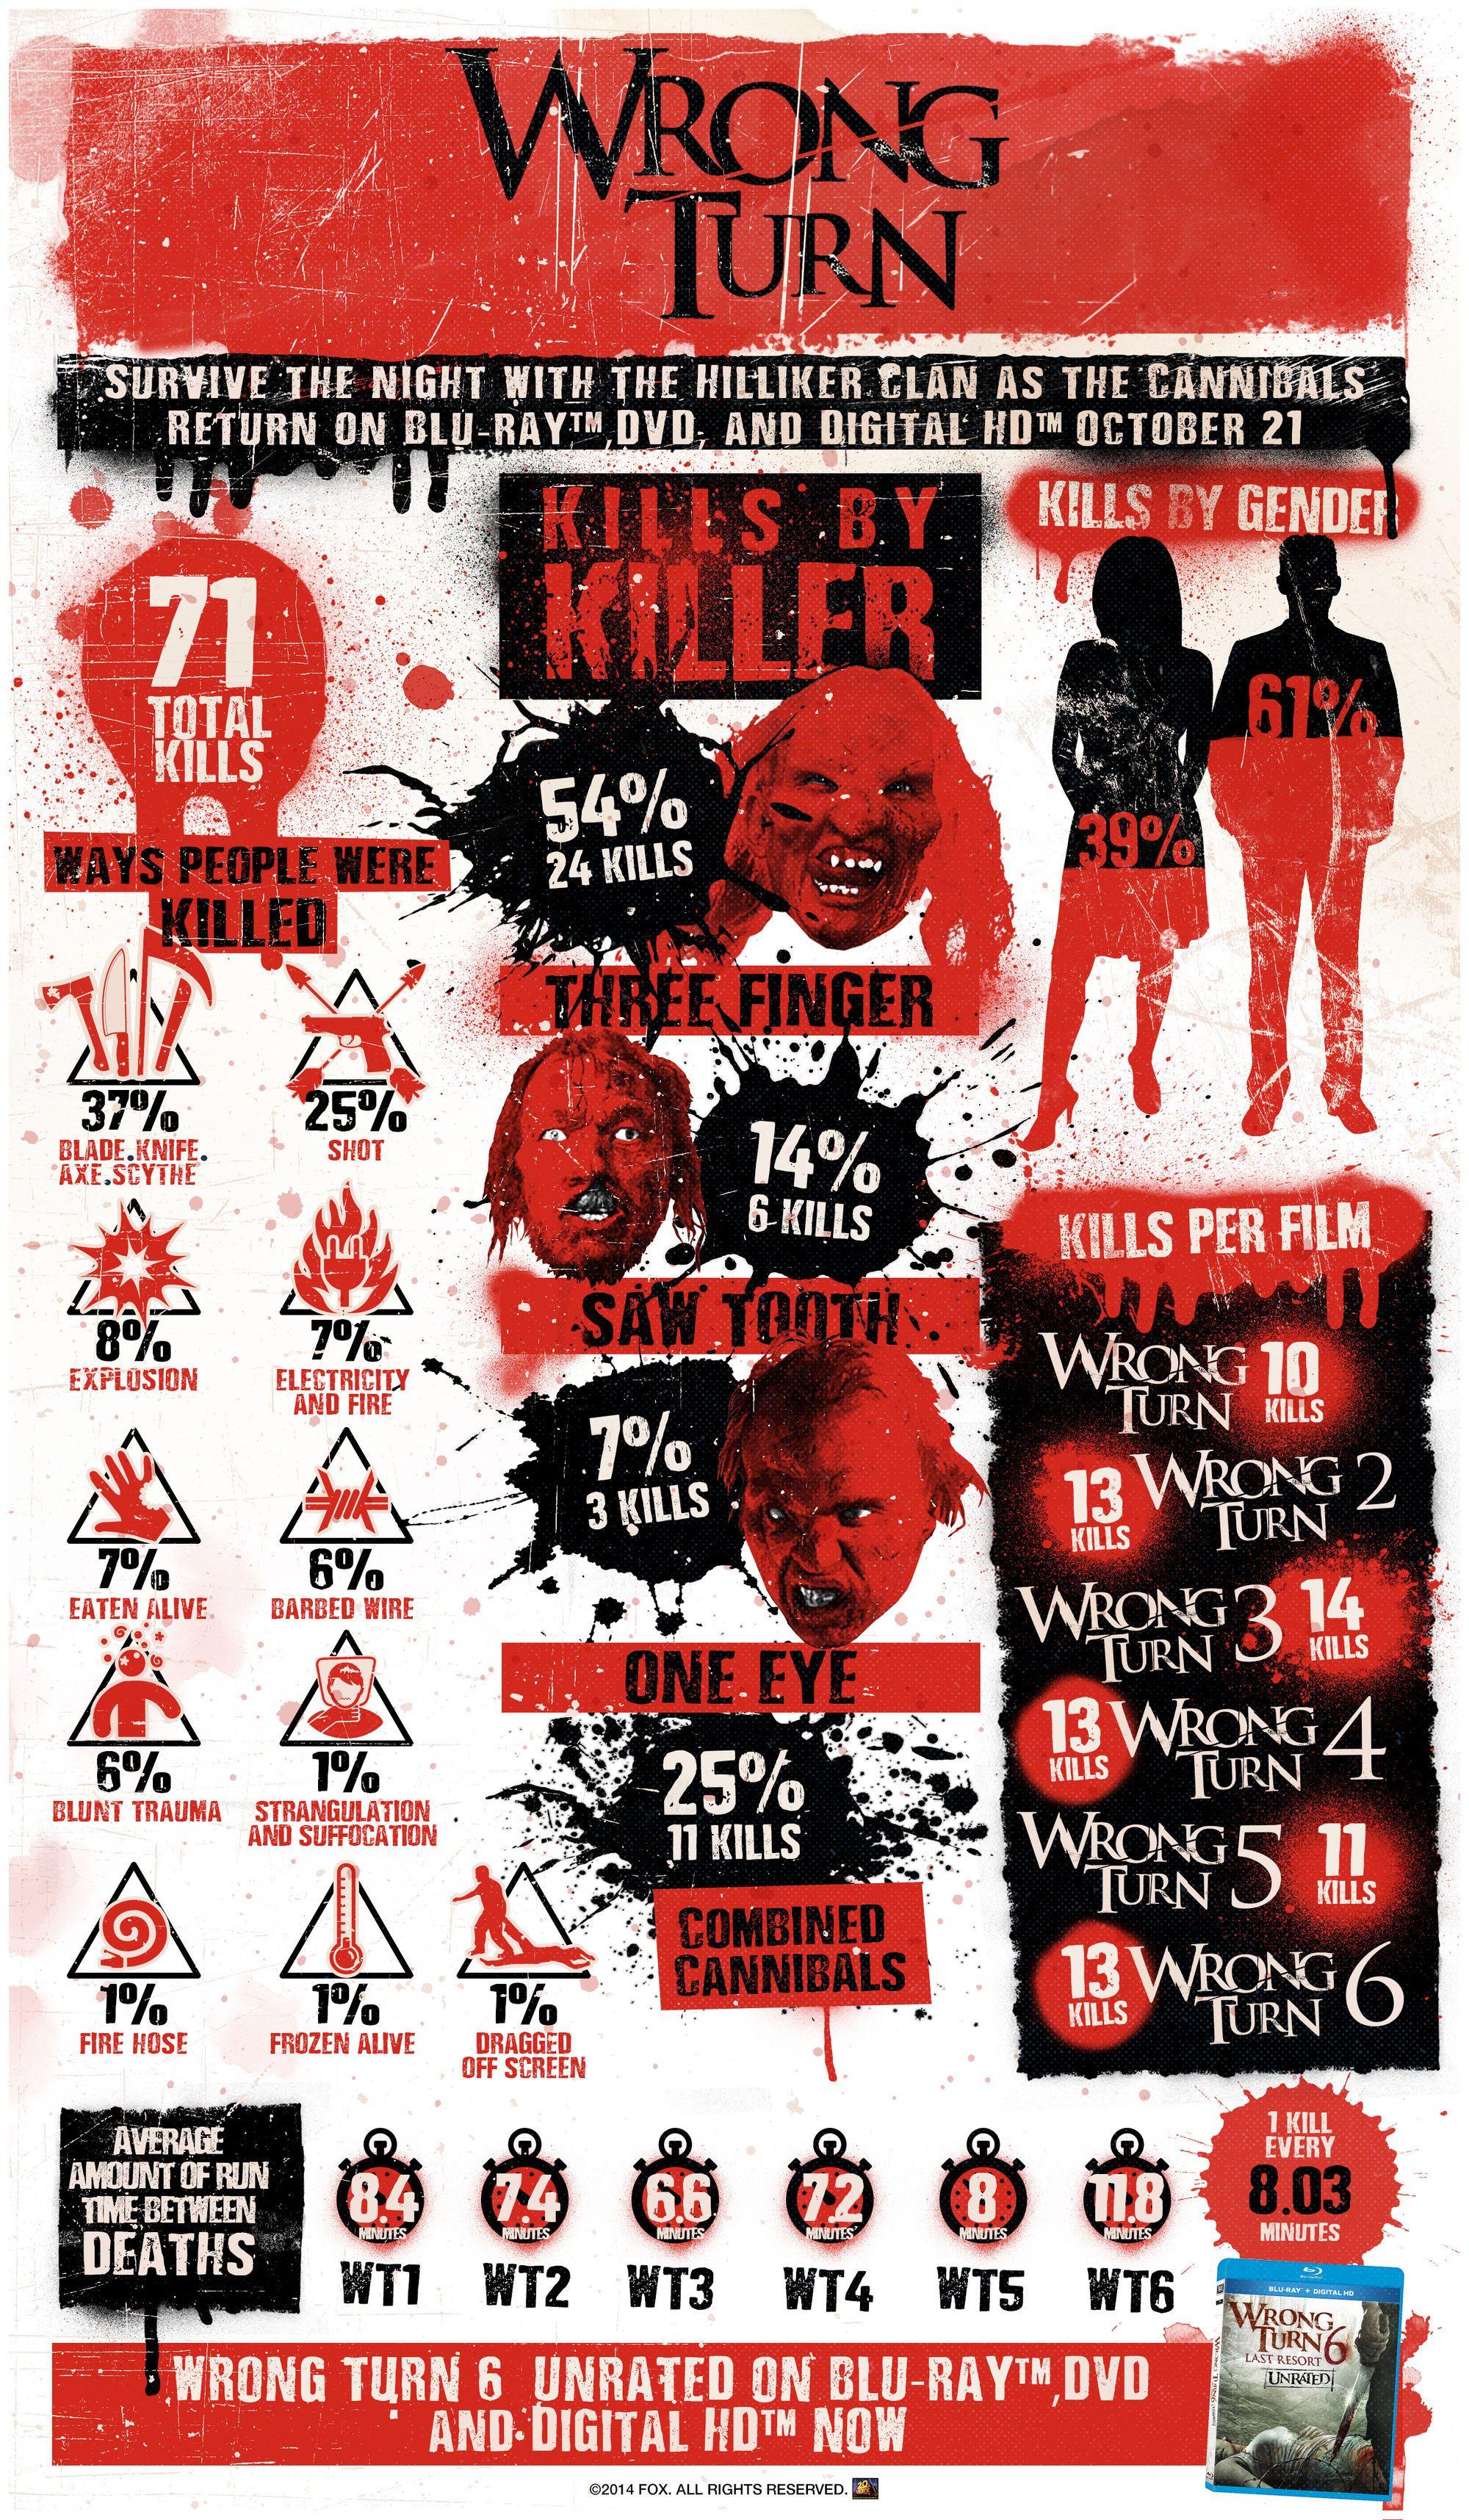 List of deaths